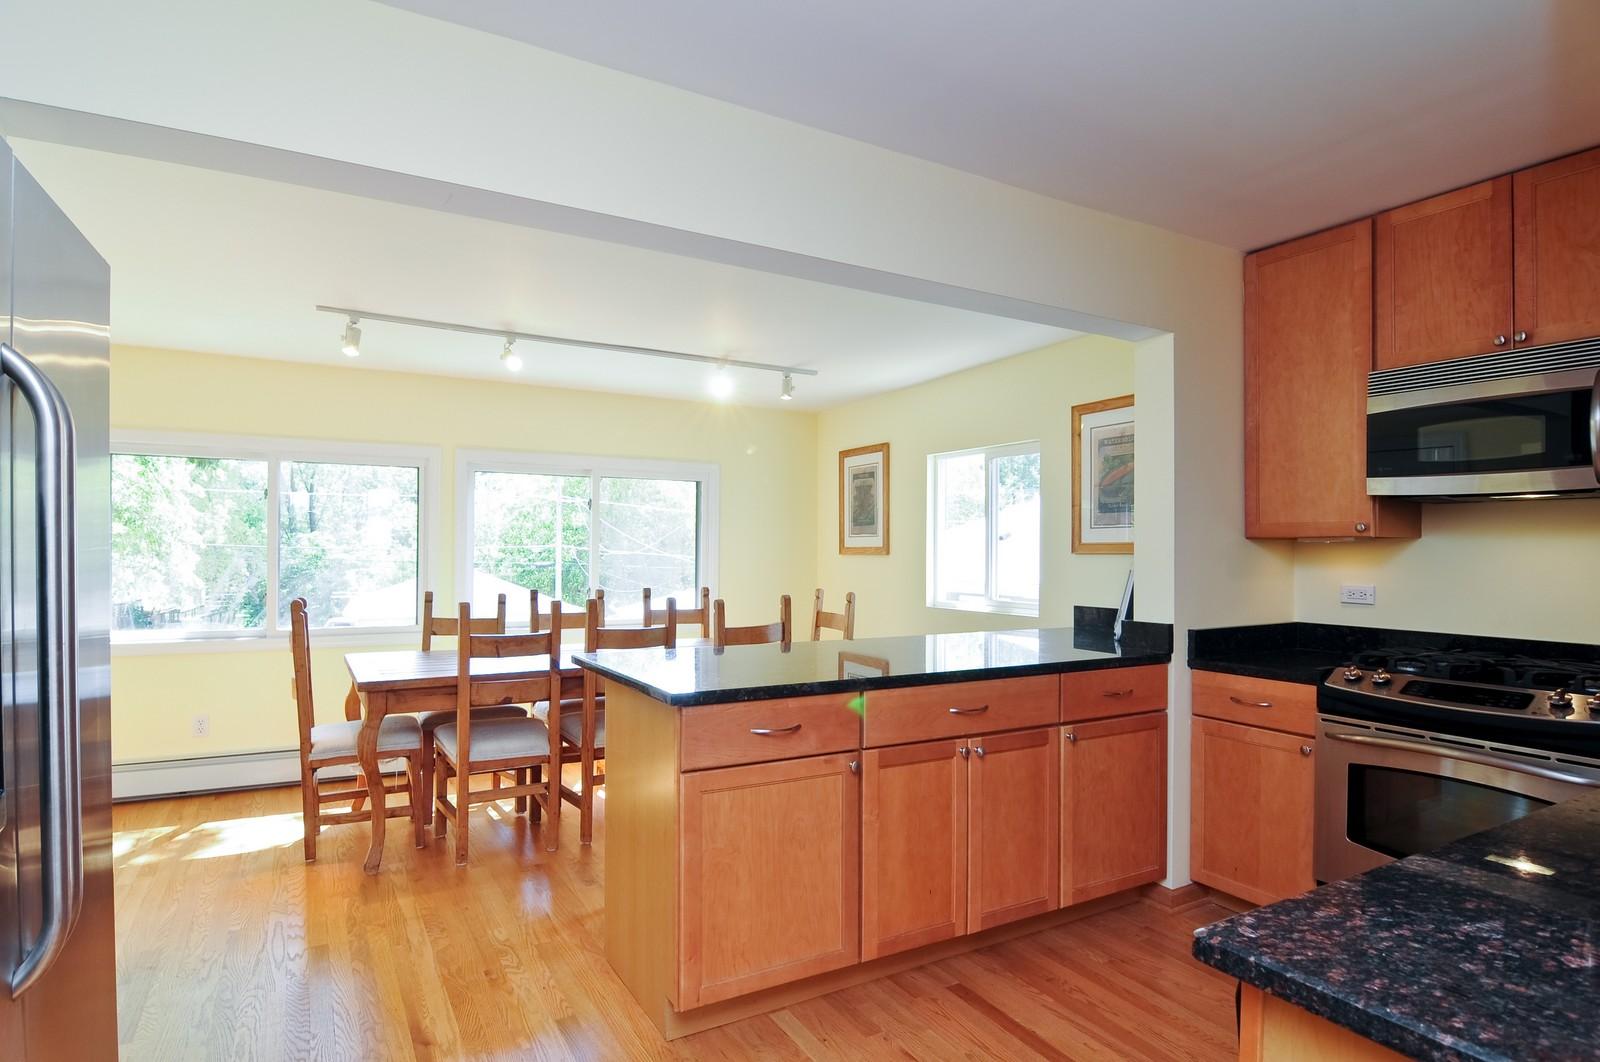 Real Estate Photography - 16 S. Pistakee Lake, Fox Lake, IL, 60020 - Kitchen